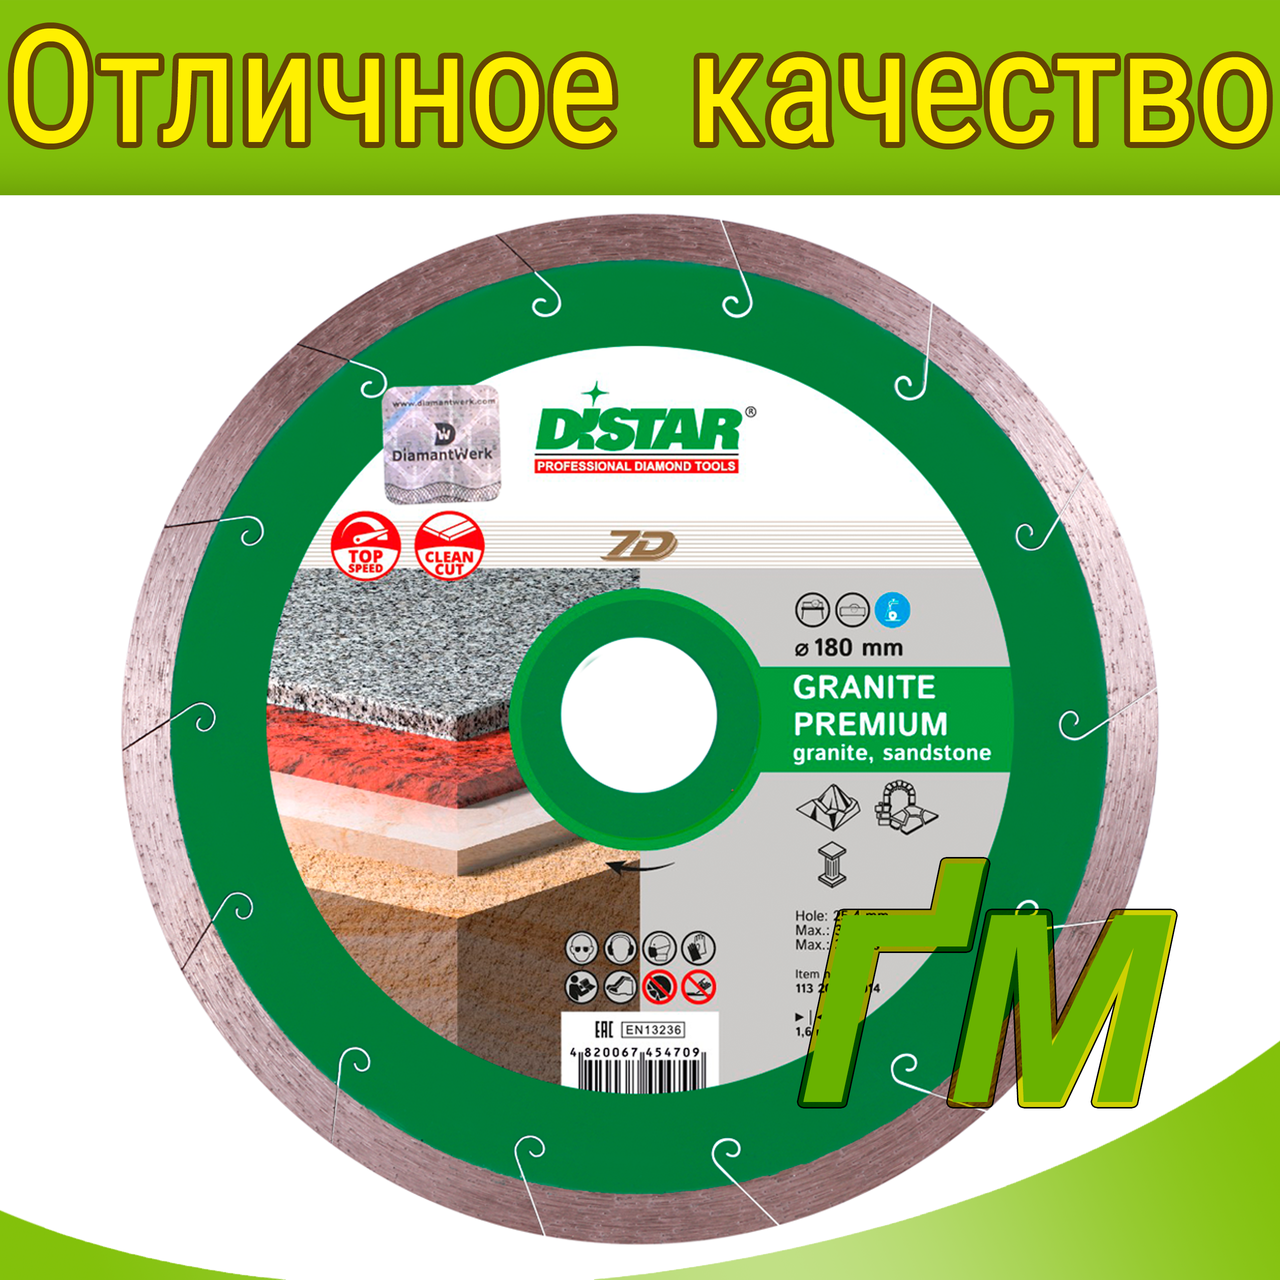 Алмазные диски для станков Distar Granite Premium 1A1R 350x2,4x10x32